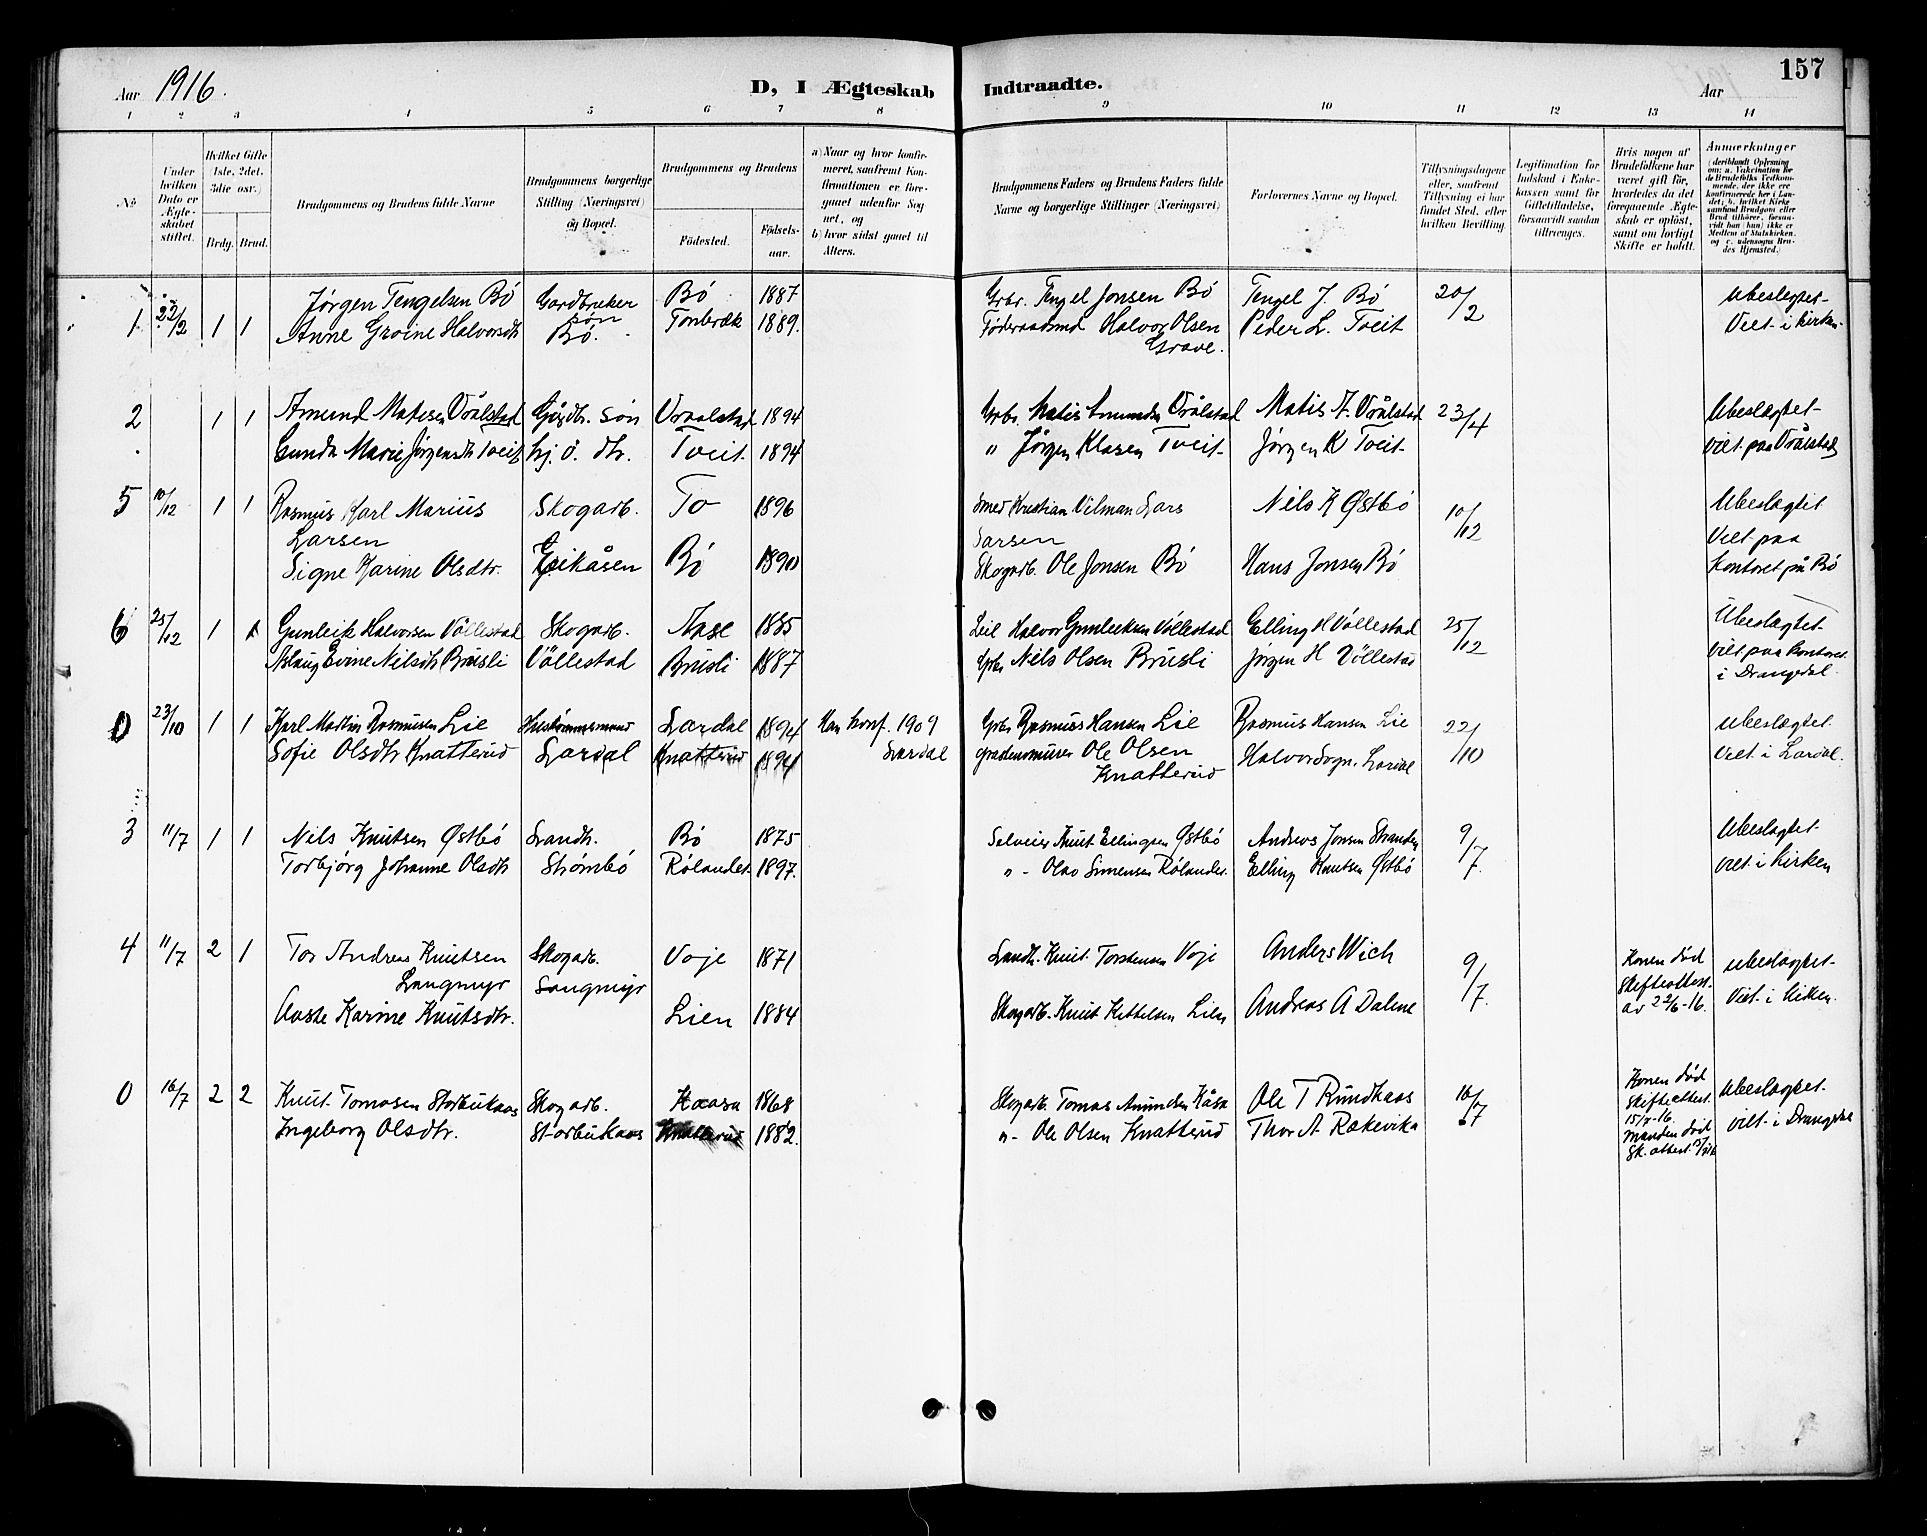 SAKO, Drangedal kirkebøker, G/Gb/L0002: Klokkerbok nr. II 2, 1895-1918, s. 157